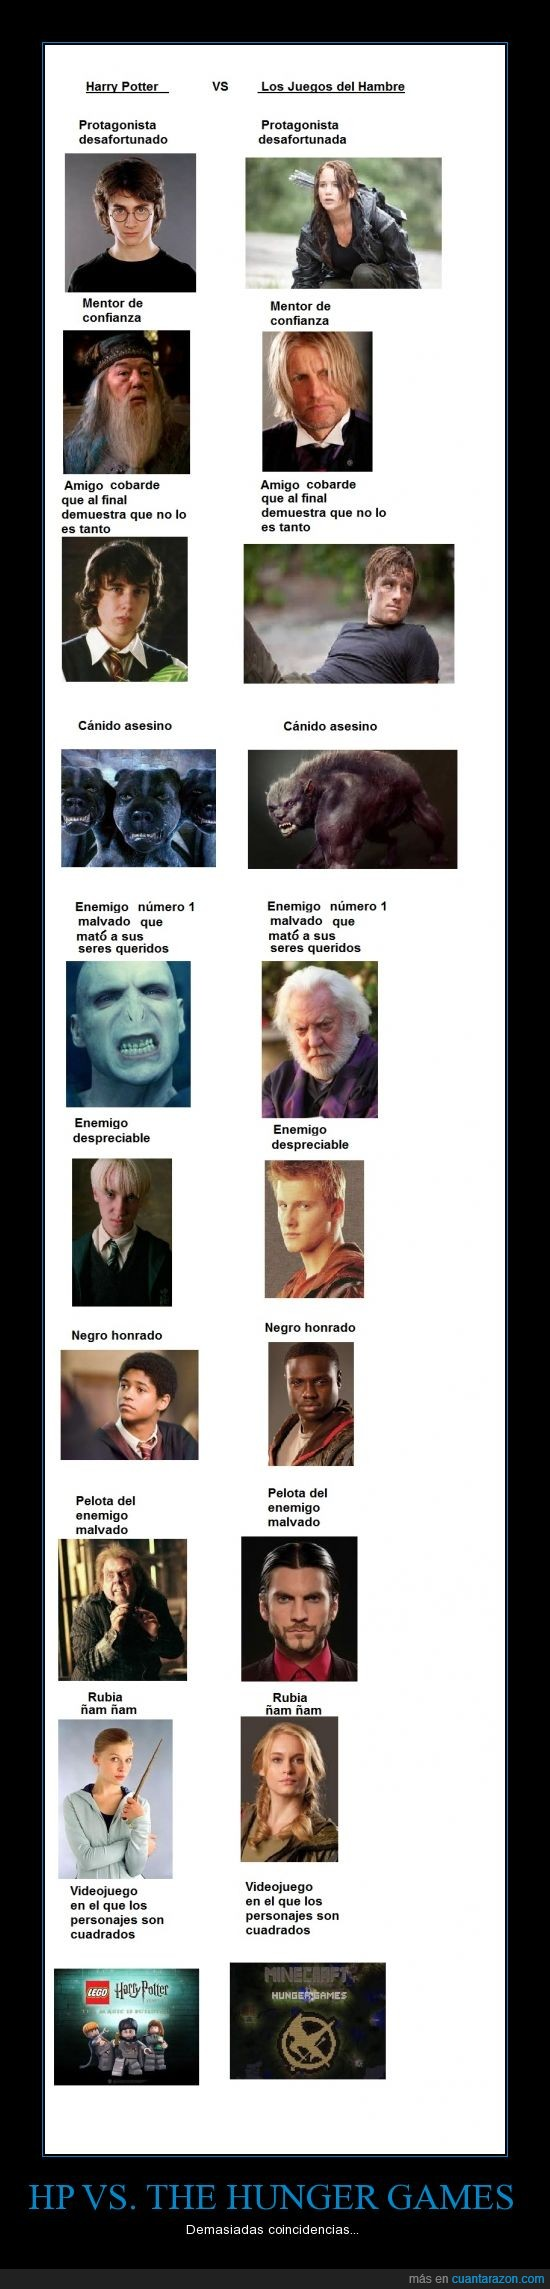 Harry Potter,Katniss Everdeen,mentor,negro,perro asesino,rubias